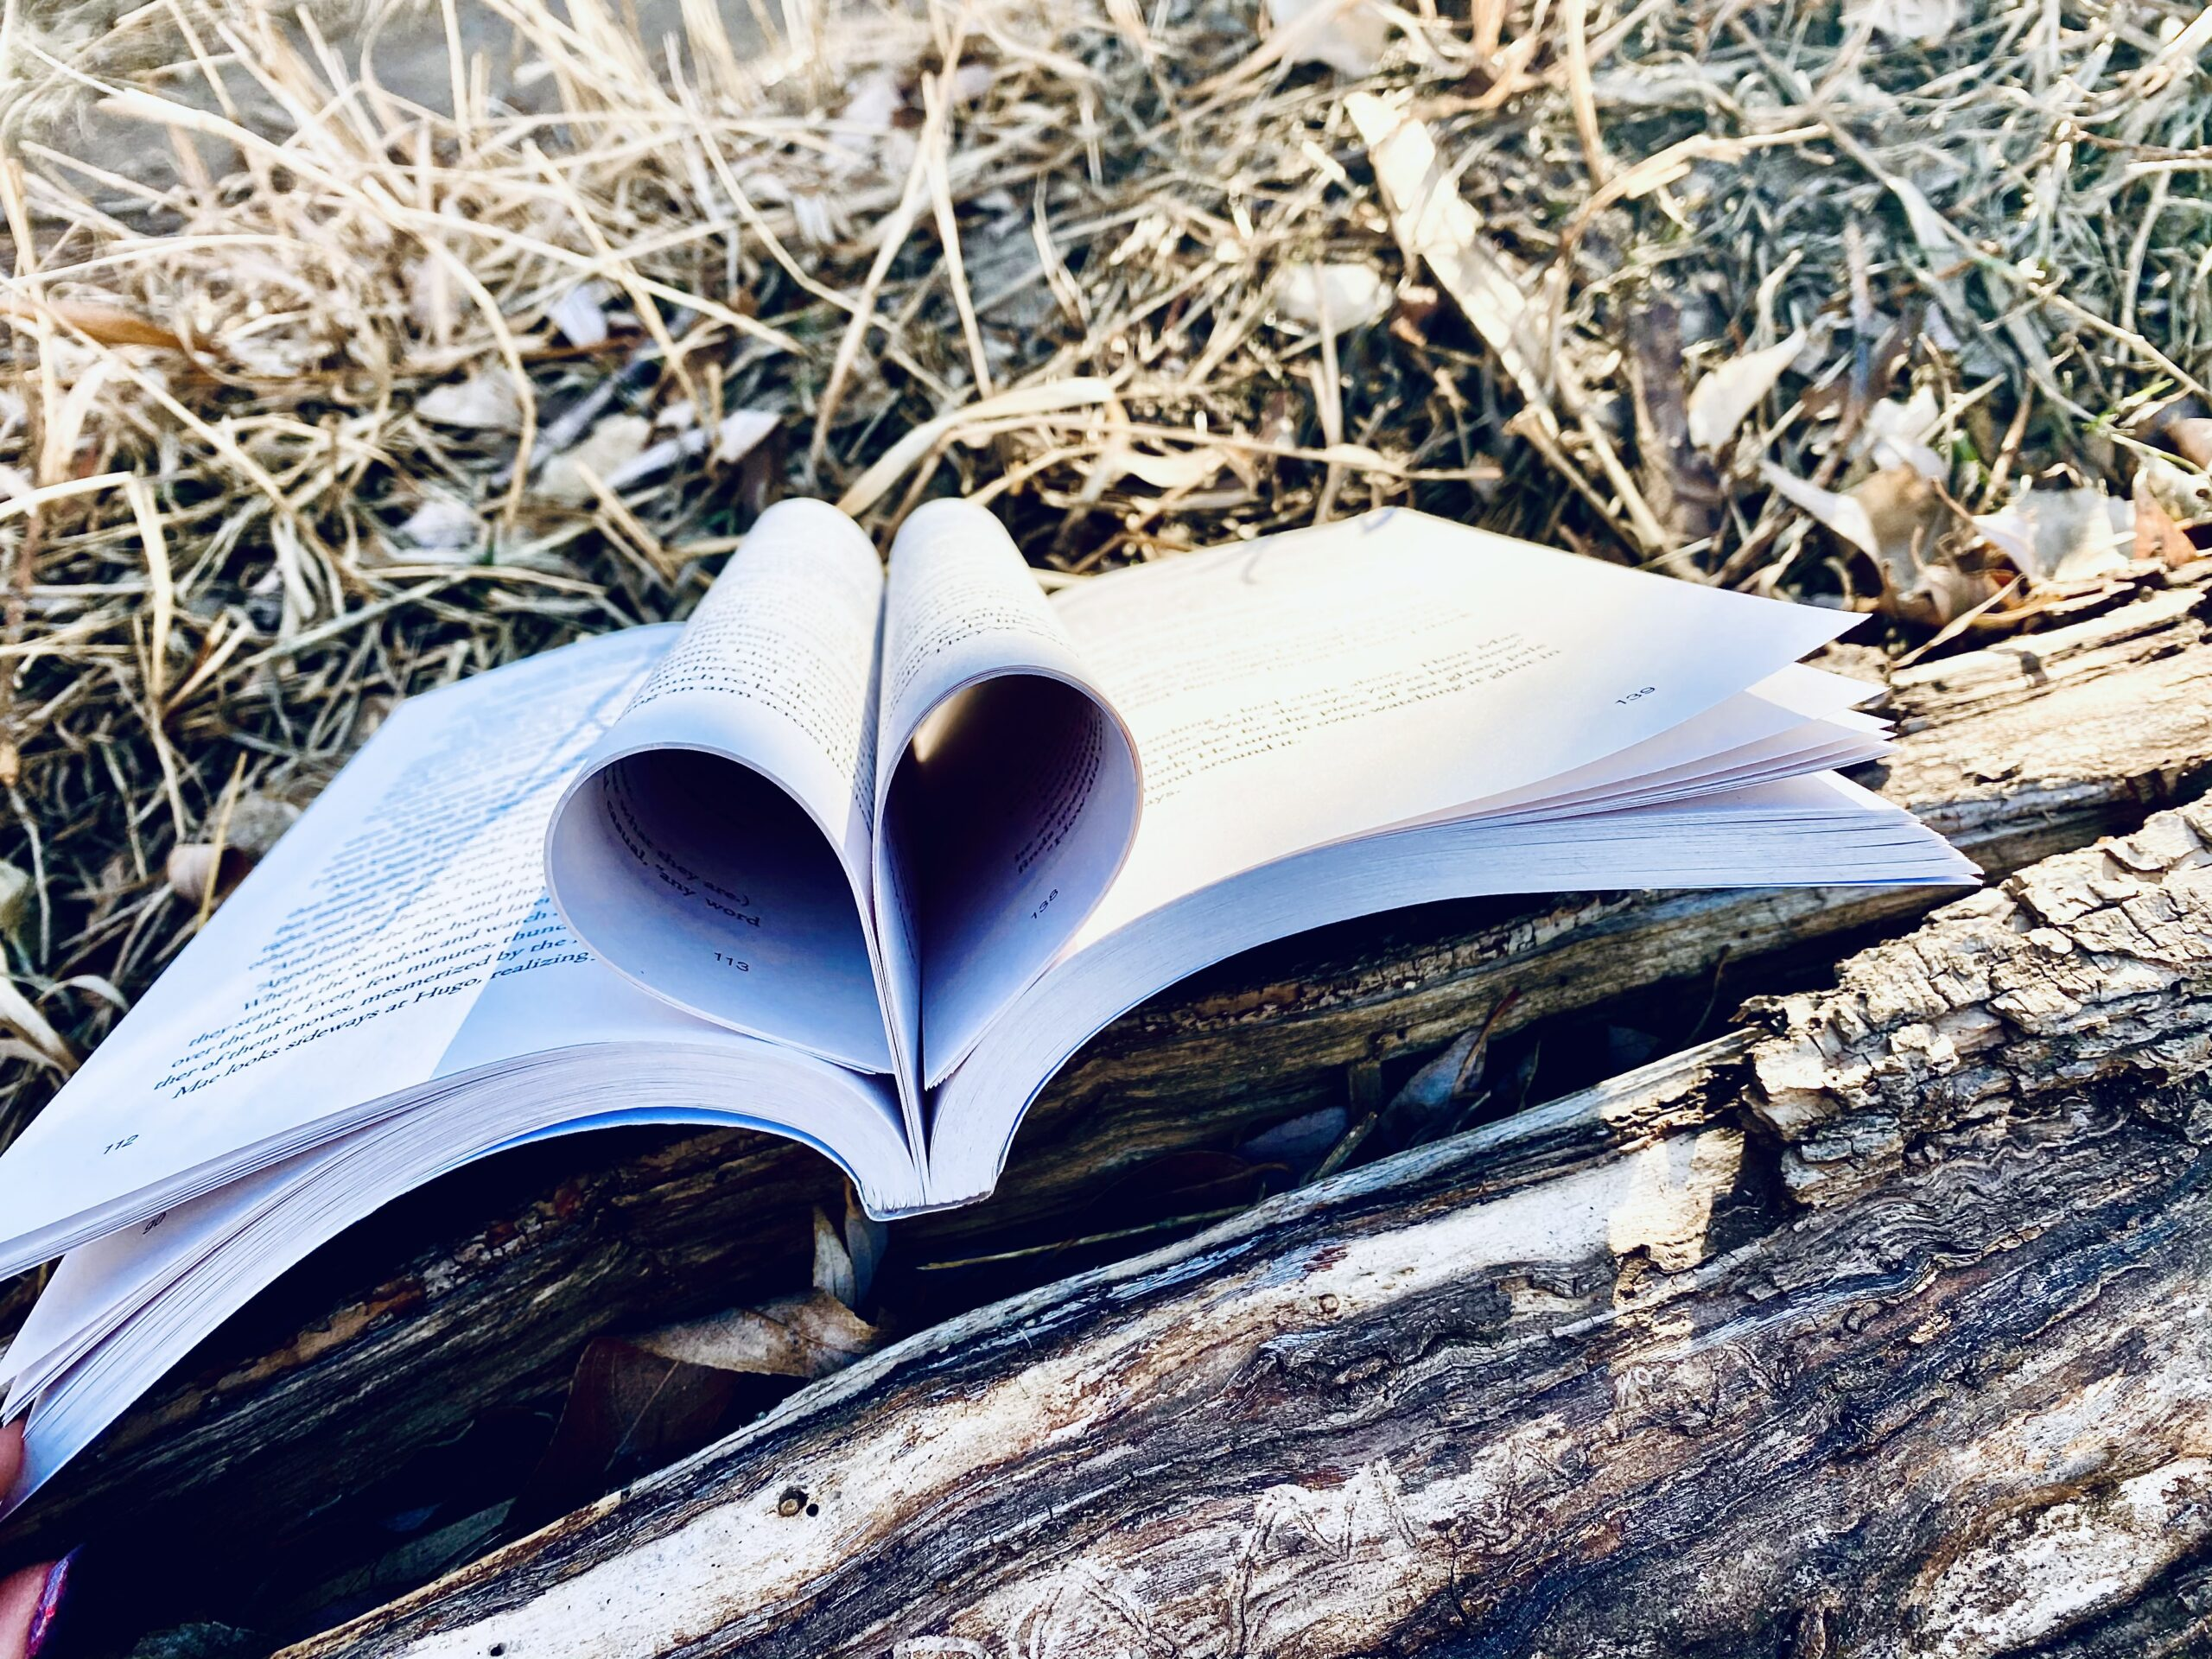 reading, writing, literature we love, beautiful books, bookstagram, books, literary